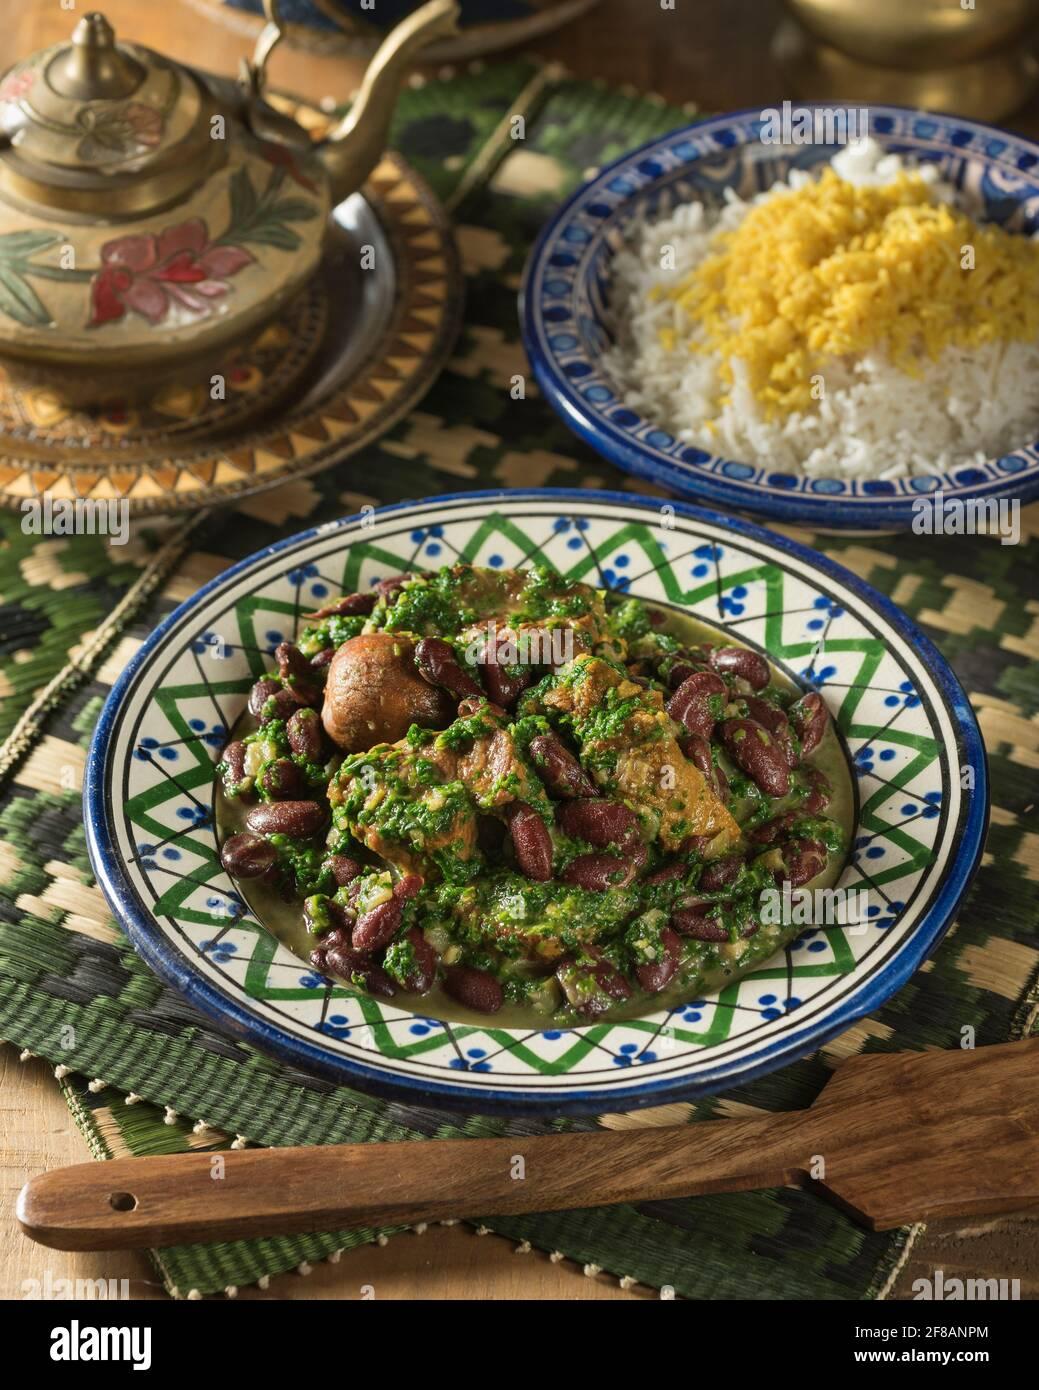 Khoresh ghormeh sabzi. Iranian lamb and herb stew. Iran Food Stock Photo